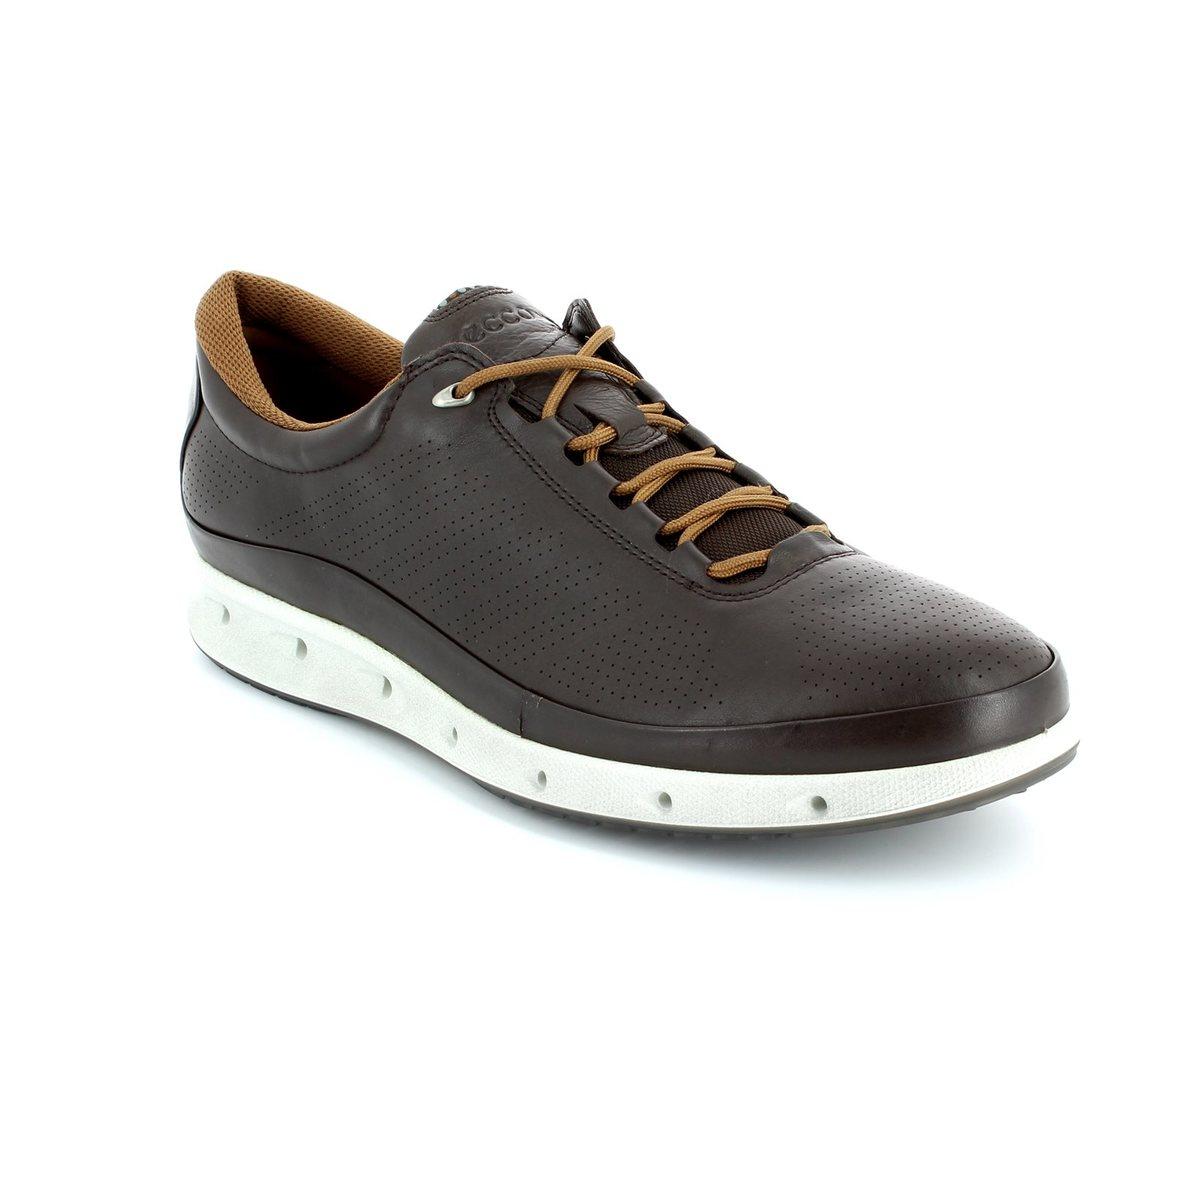 Gola Shoes Australia